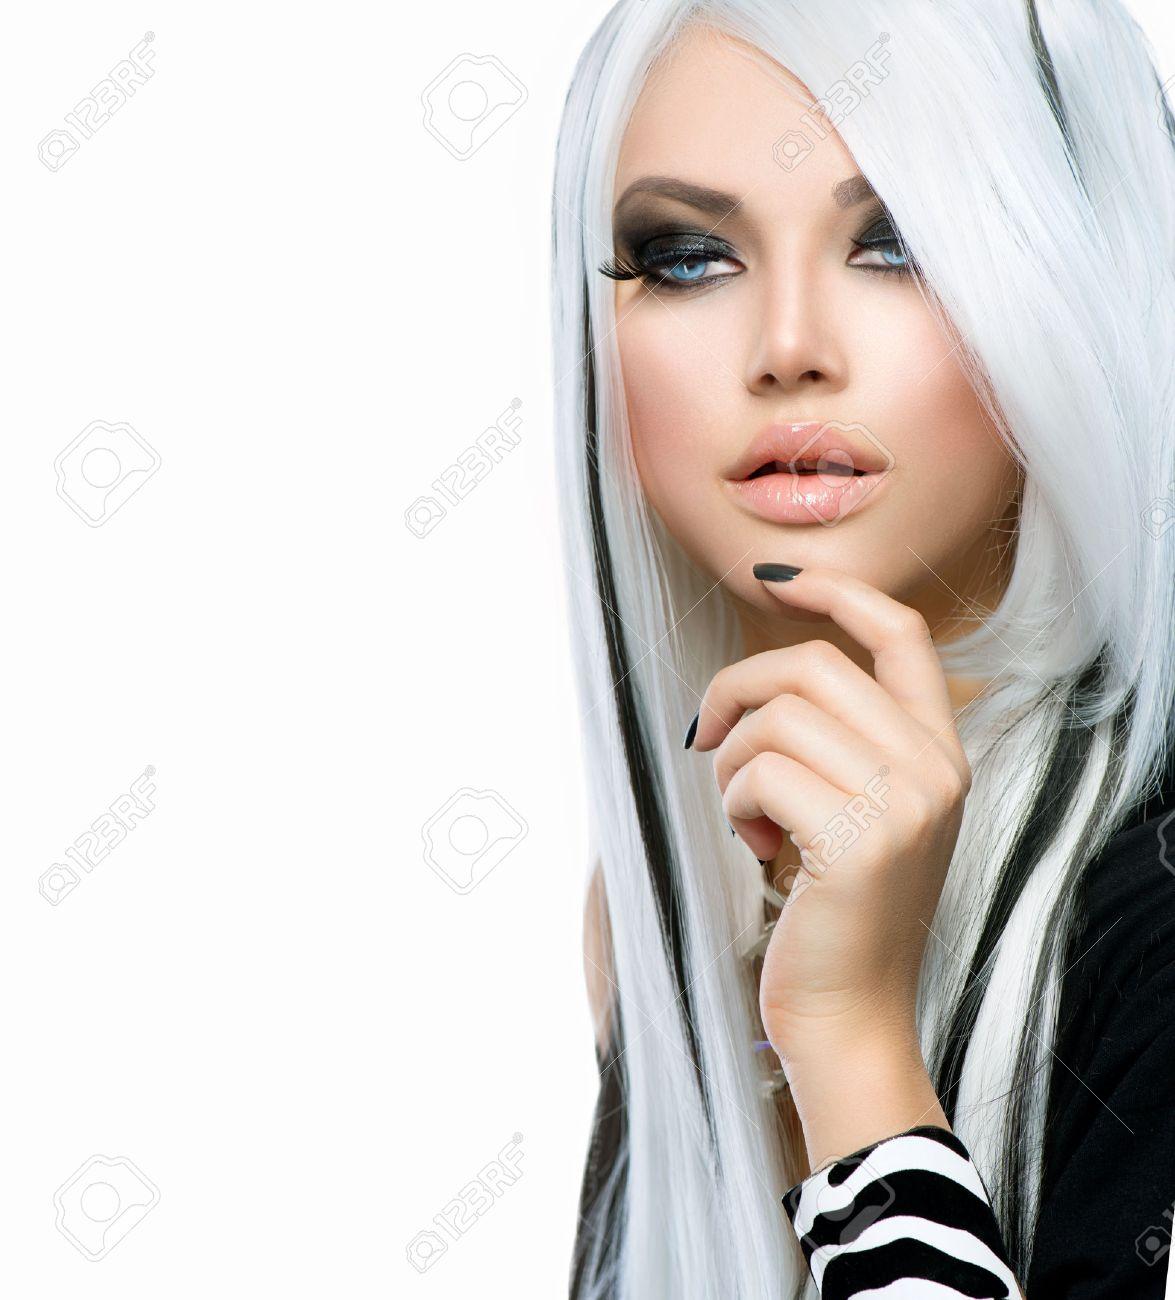 Beauty Fashion Girl black and white style  Long White Hair Stock Photo - 24331832